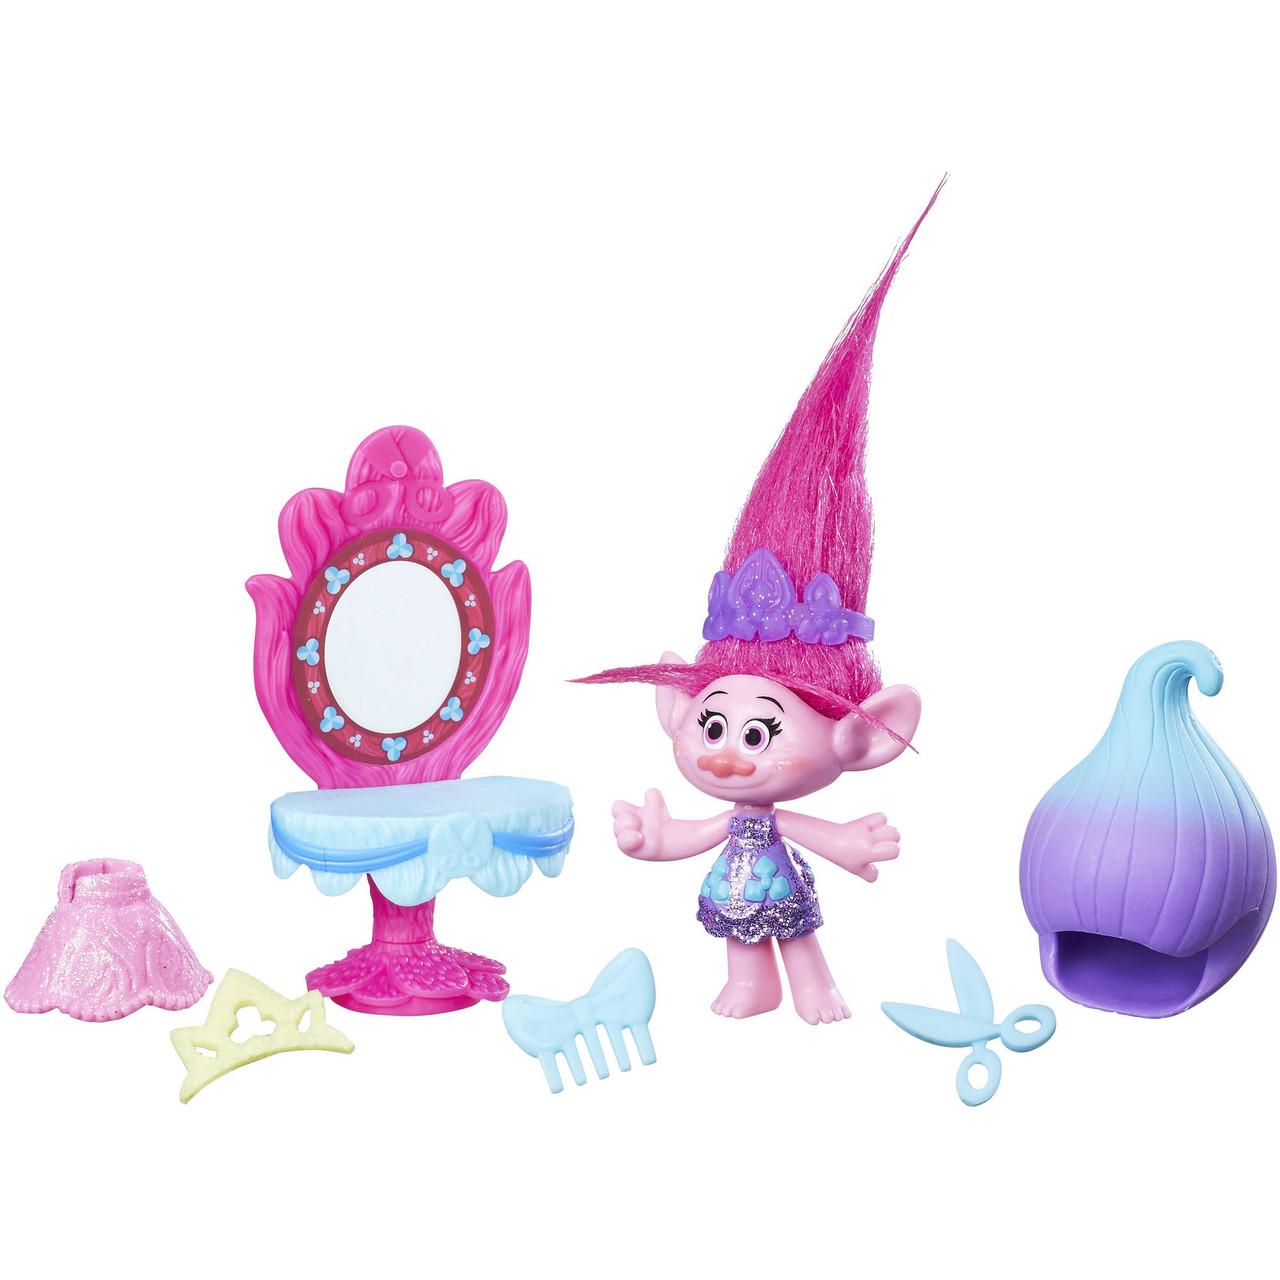 Игровой набор DreamWorks Trolls Poppy Style Set